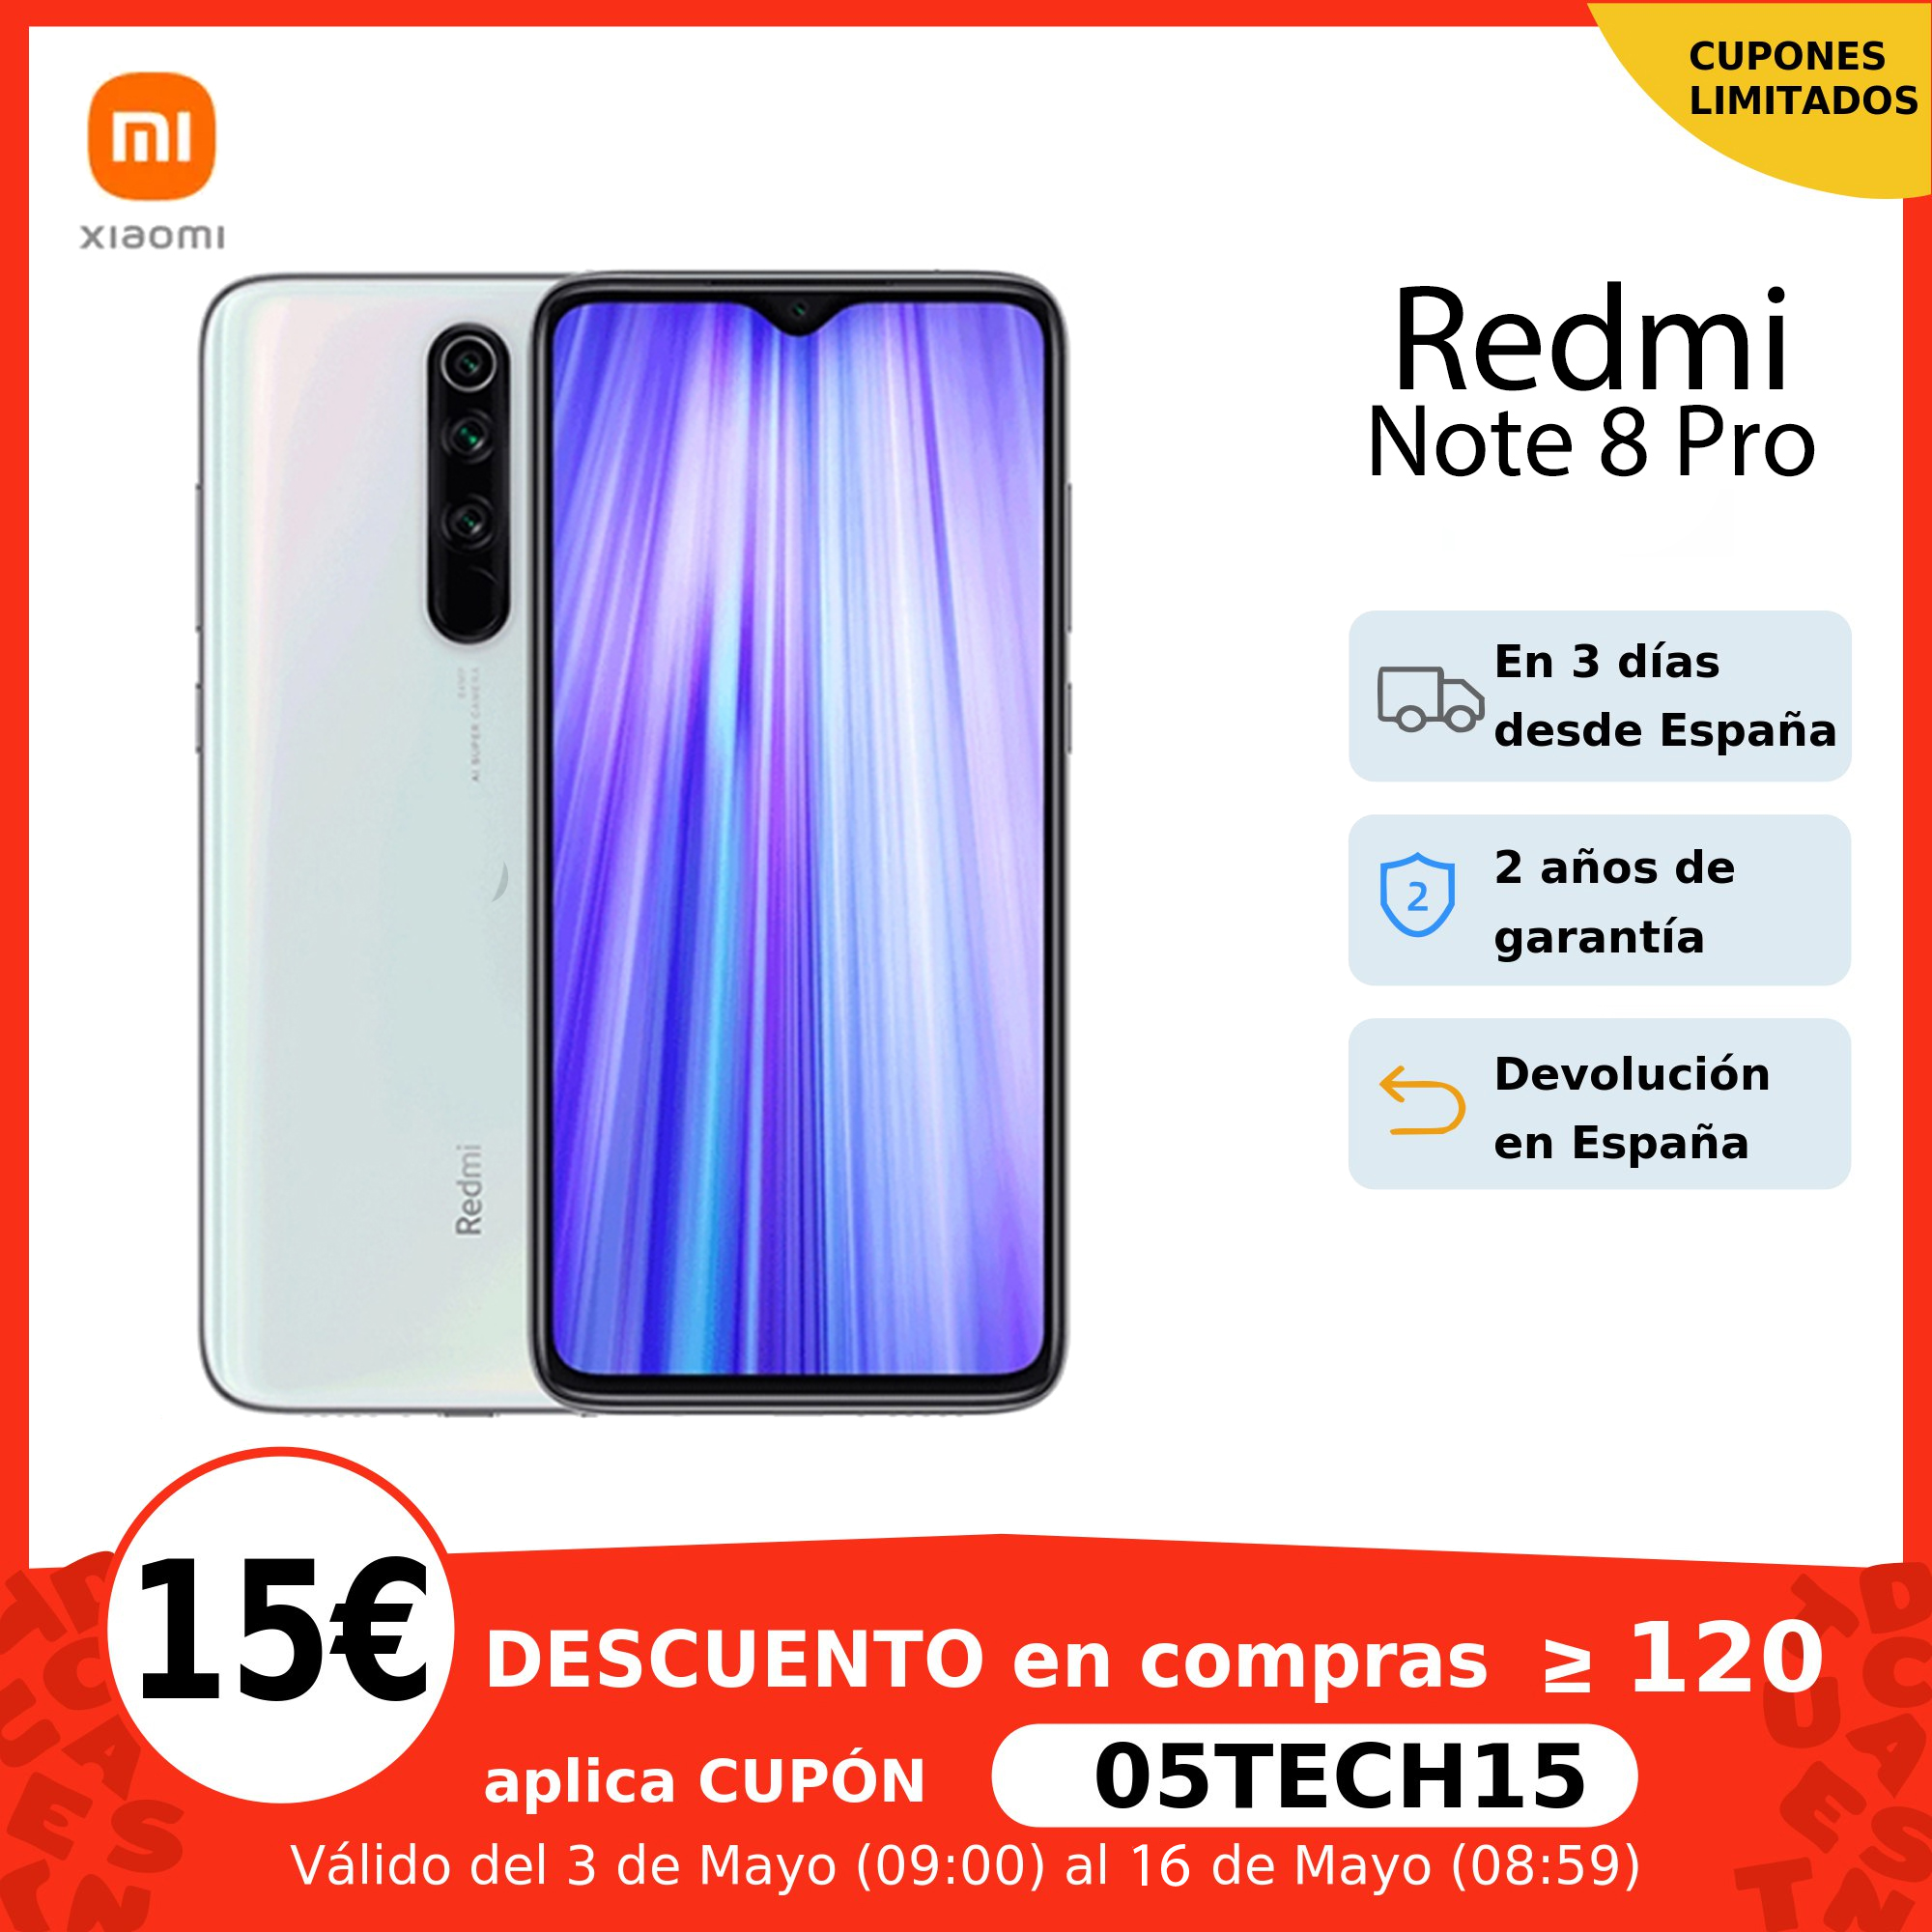 Xiaomi Redmi Note 8 Pro, Versión global, 6GB RAM 64GB/128GB ROM, MTK Helio G90T móvil, 64MP Cámara, 4500mAh 18W QC3.0 UFS 2.1, €12 Code:11112020ES12+€10 Seleccionar cupón on 11.11 09:00|Teléfonos móviles| - AliExpress